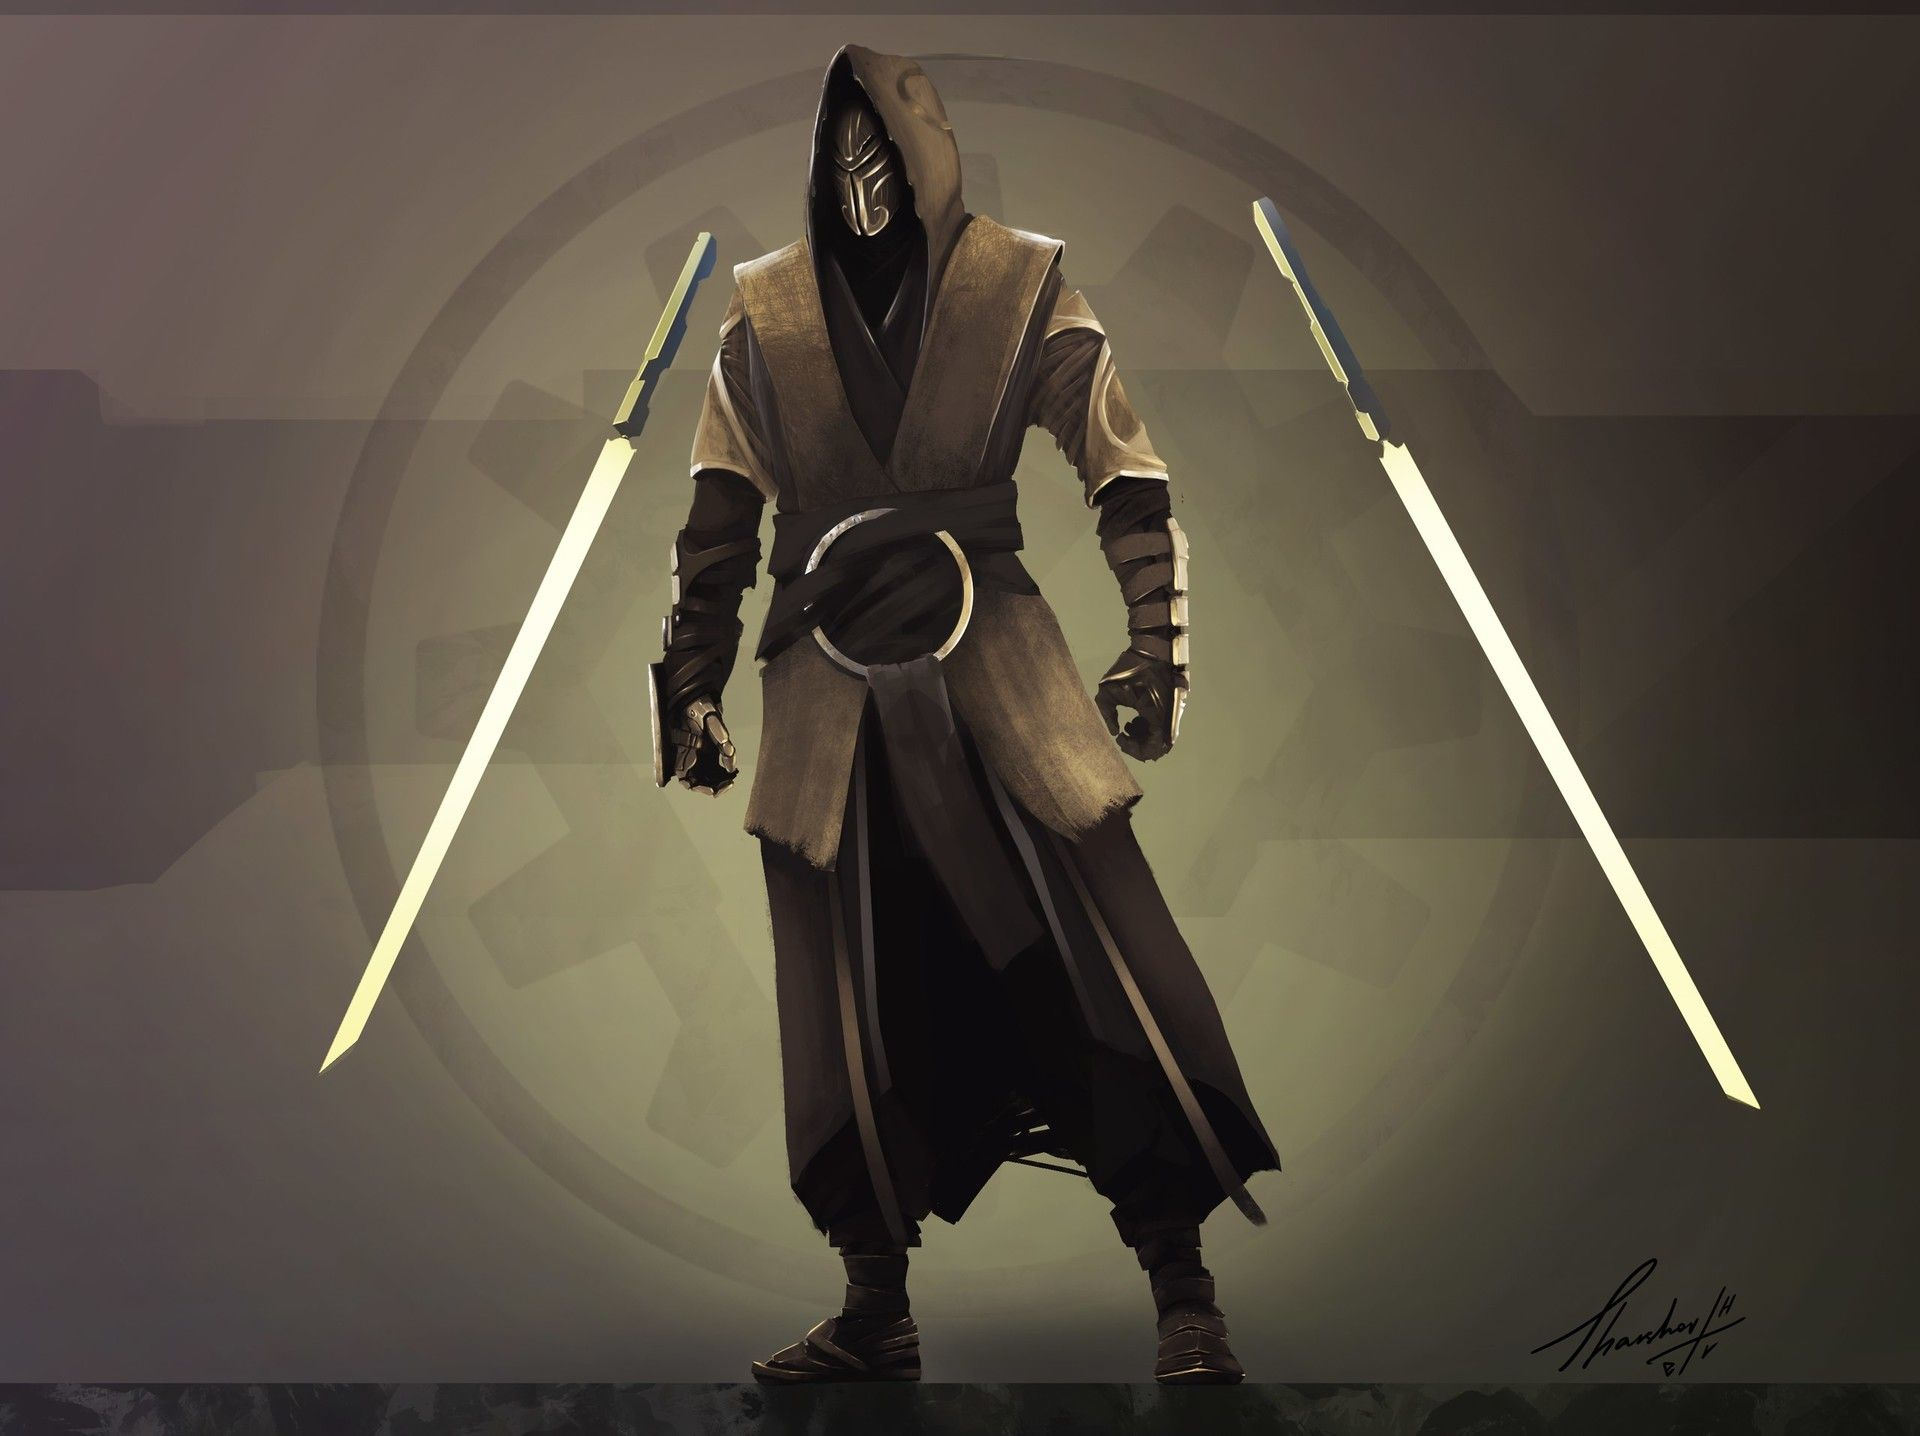 Gray Jedi Star Wars Characters Pictures Star Wars Jedi Grey Jedi